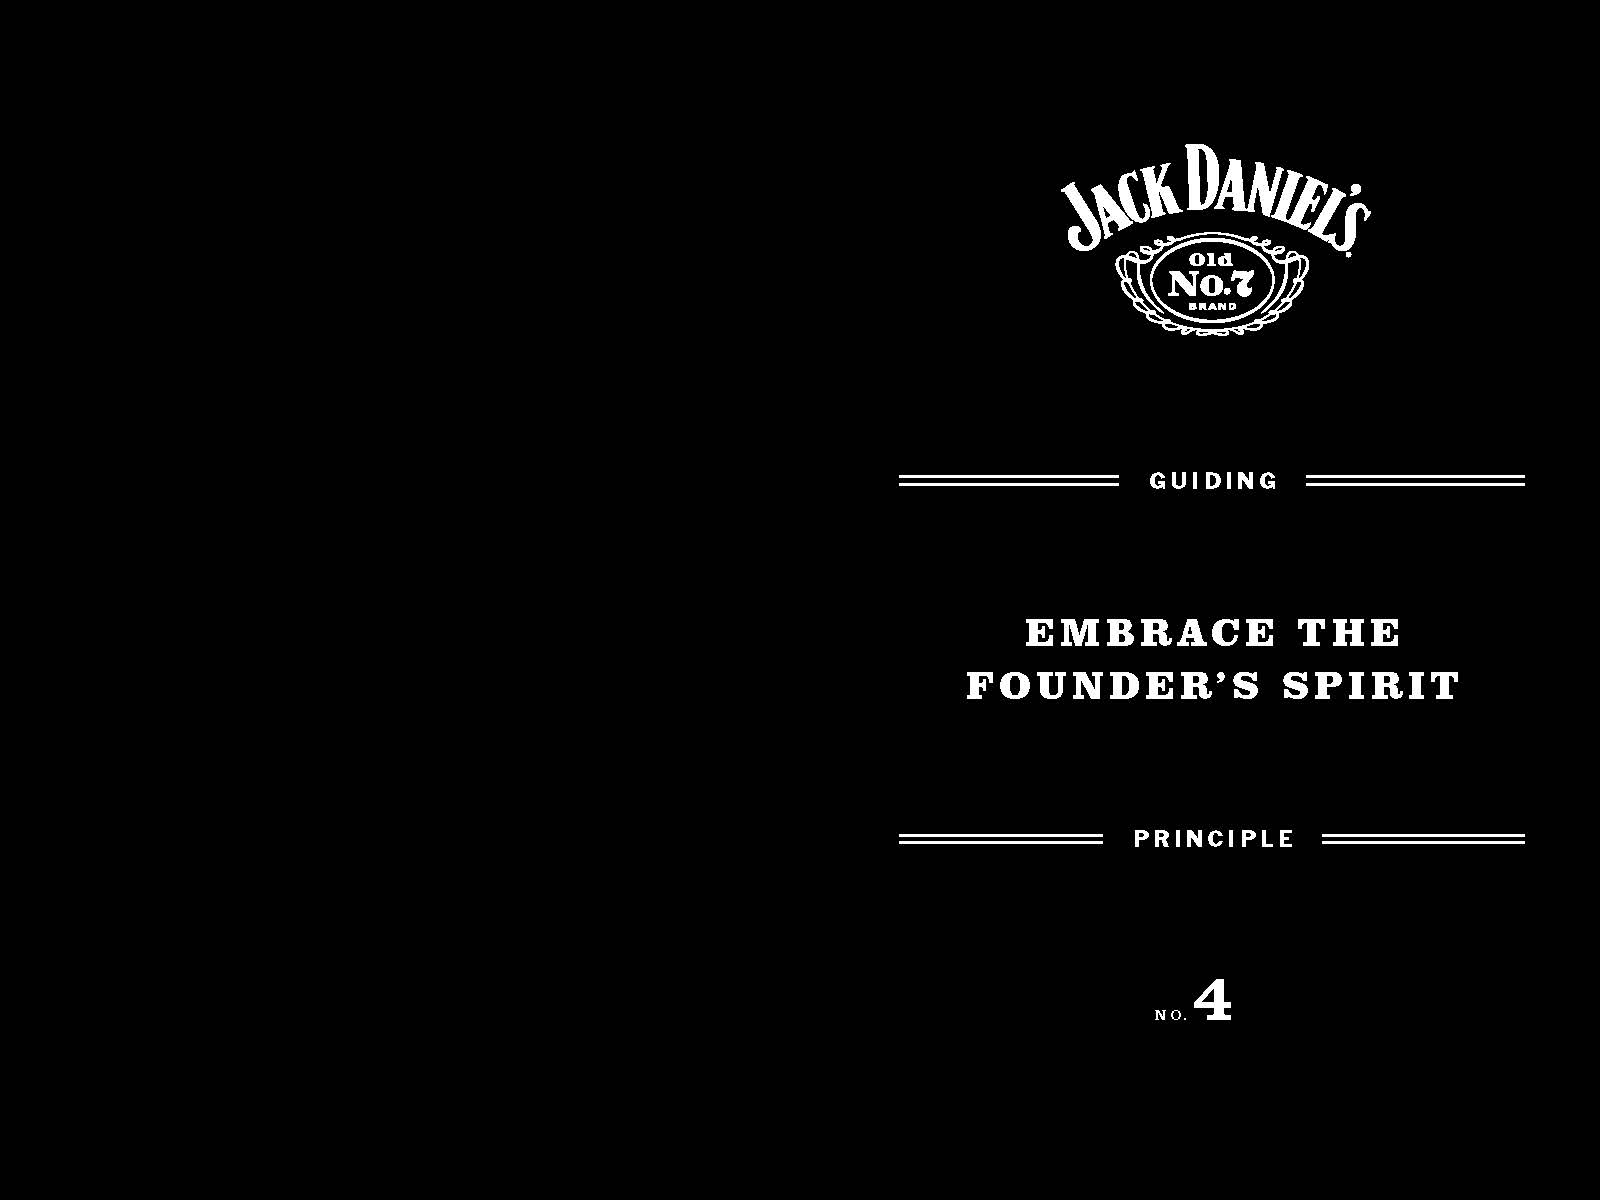 Jack Daniel's Guiding Principles 2012_Page_31.jpg